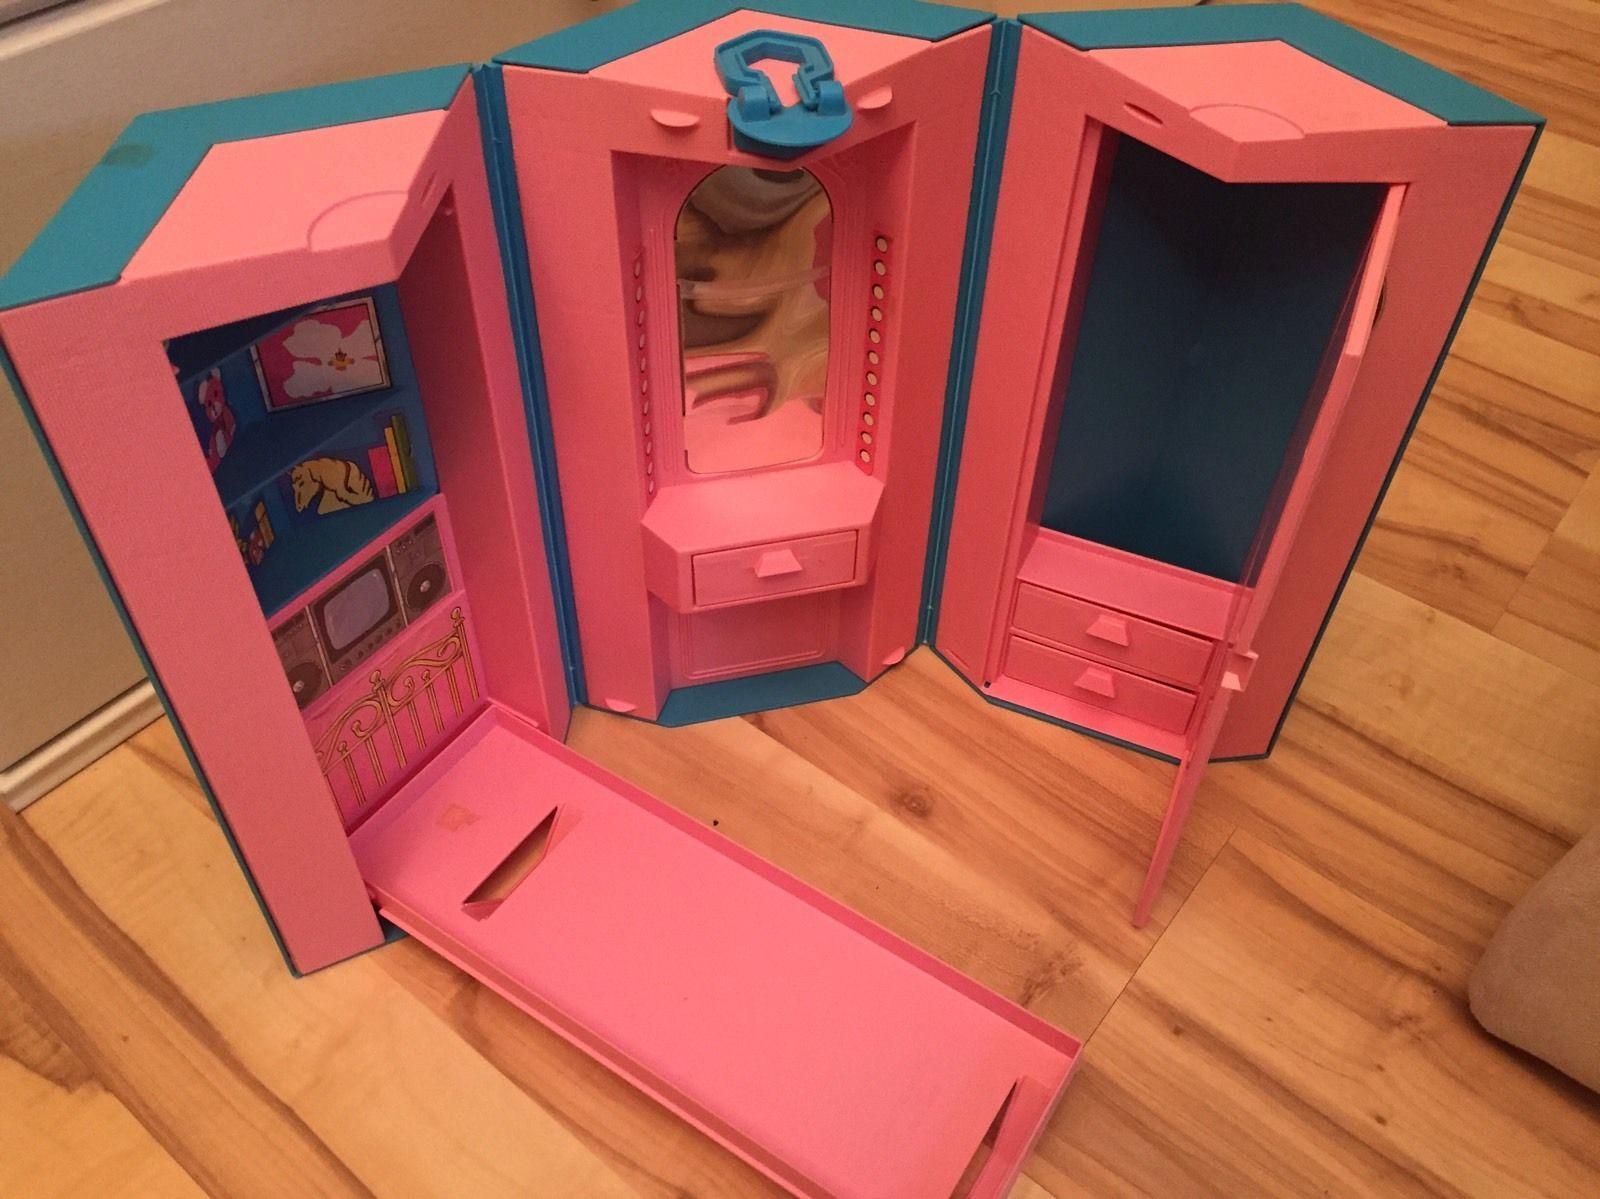 Bagno Barbie ~ Barbie camper van bed у нас такой был до сих пор на даче валяется